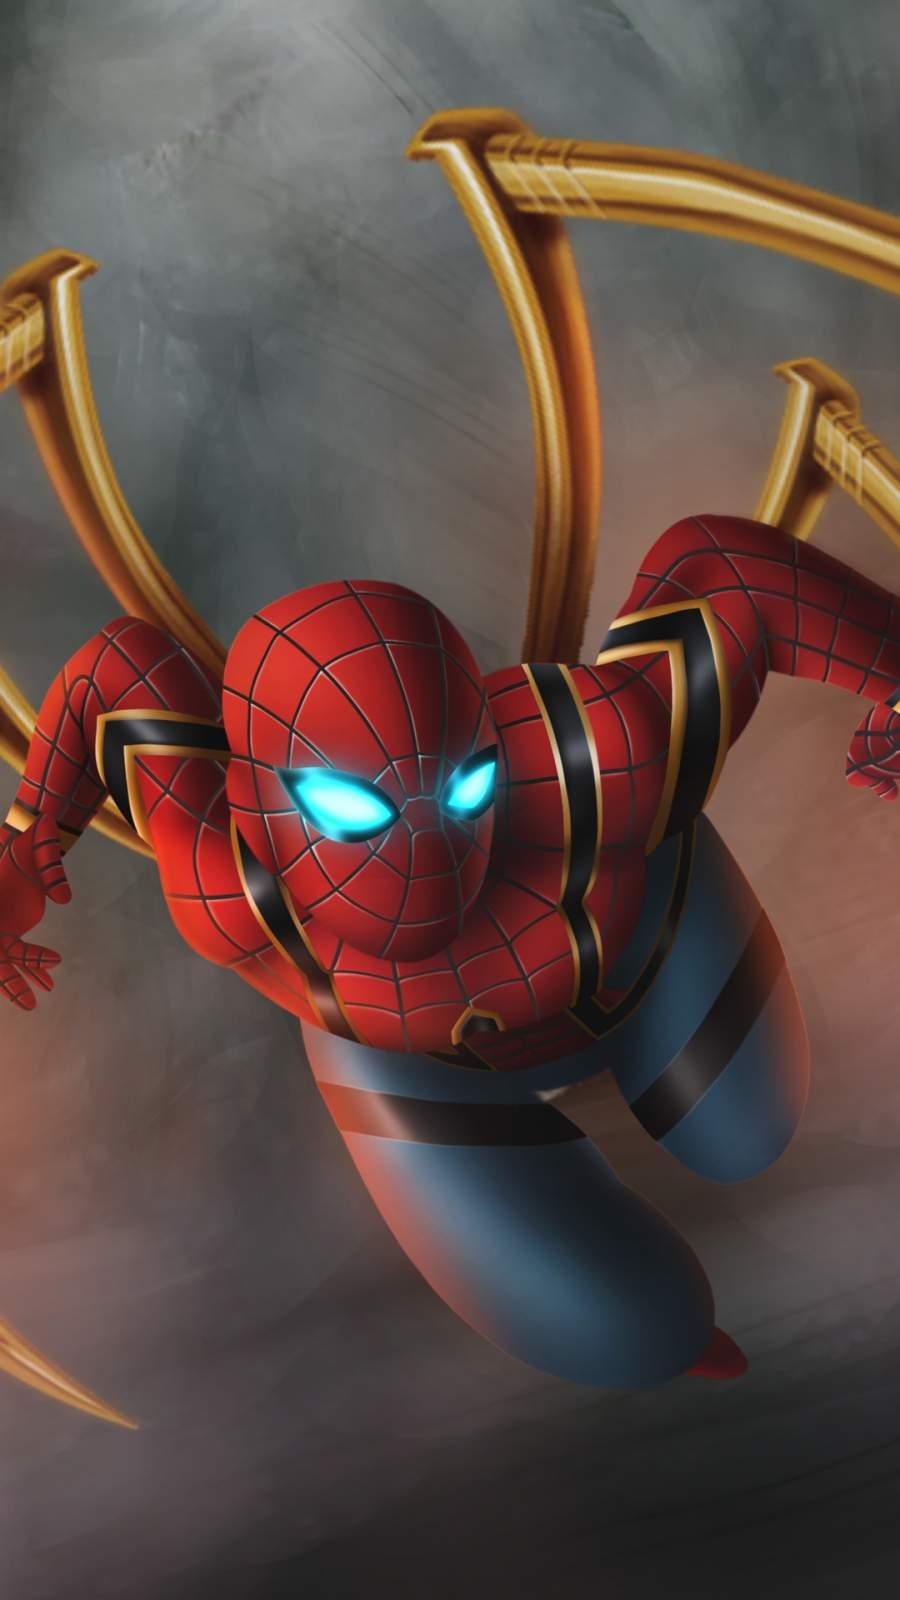 Iron Spiderman Artwork iPhone Wallpaper